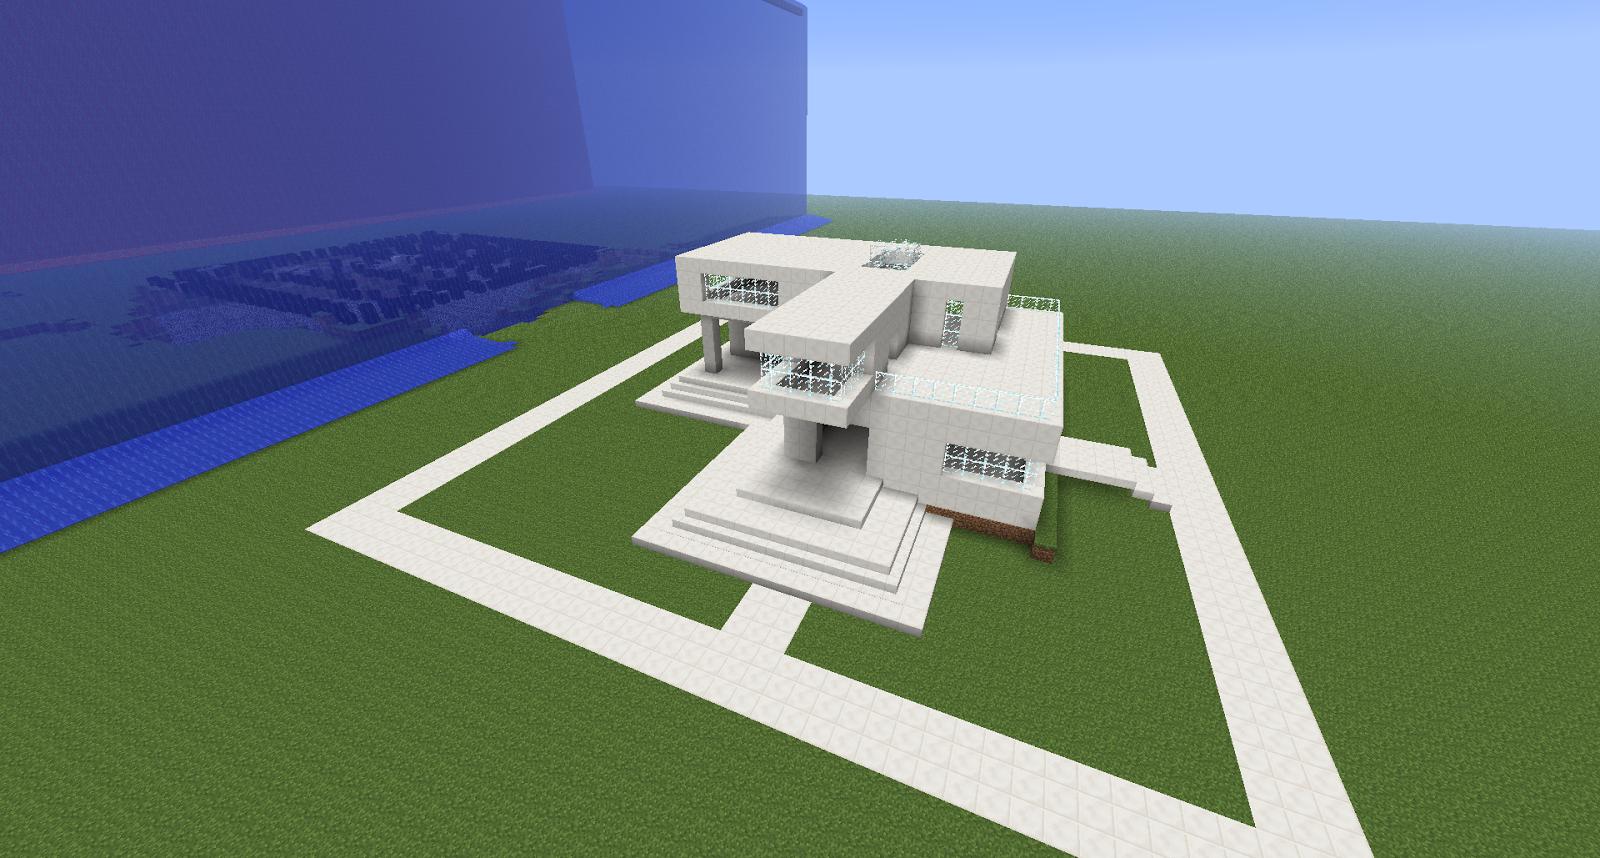 Arquitectura en minecraft